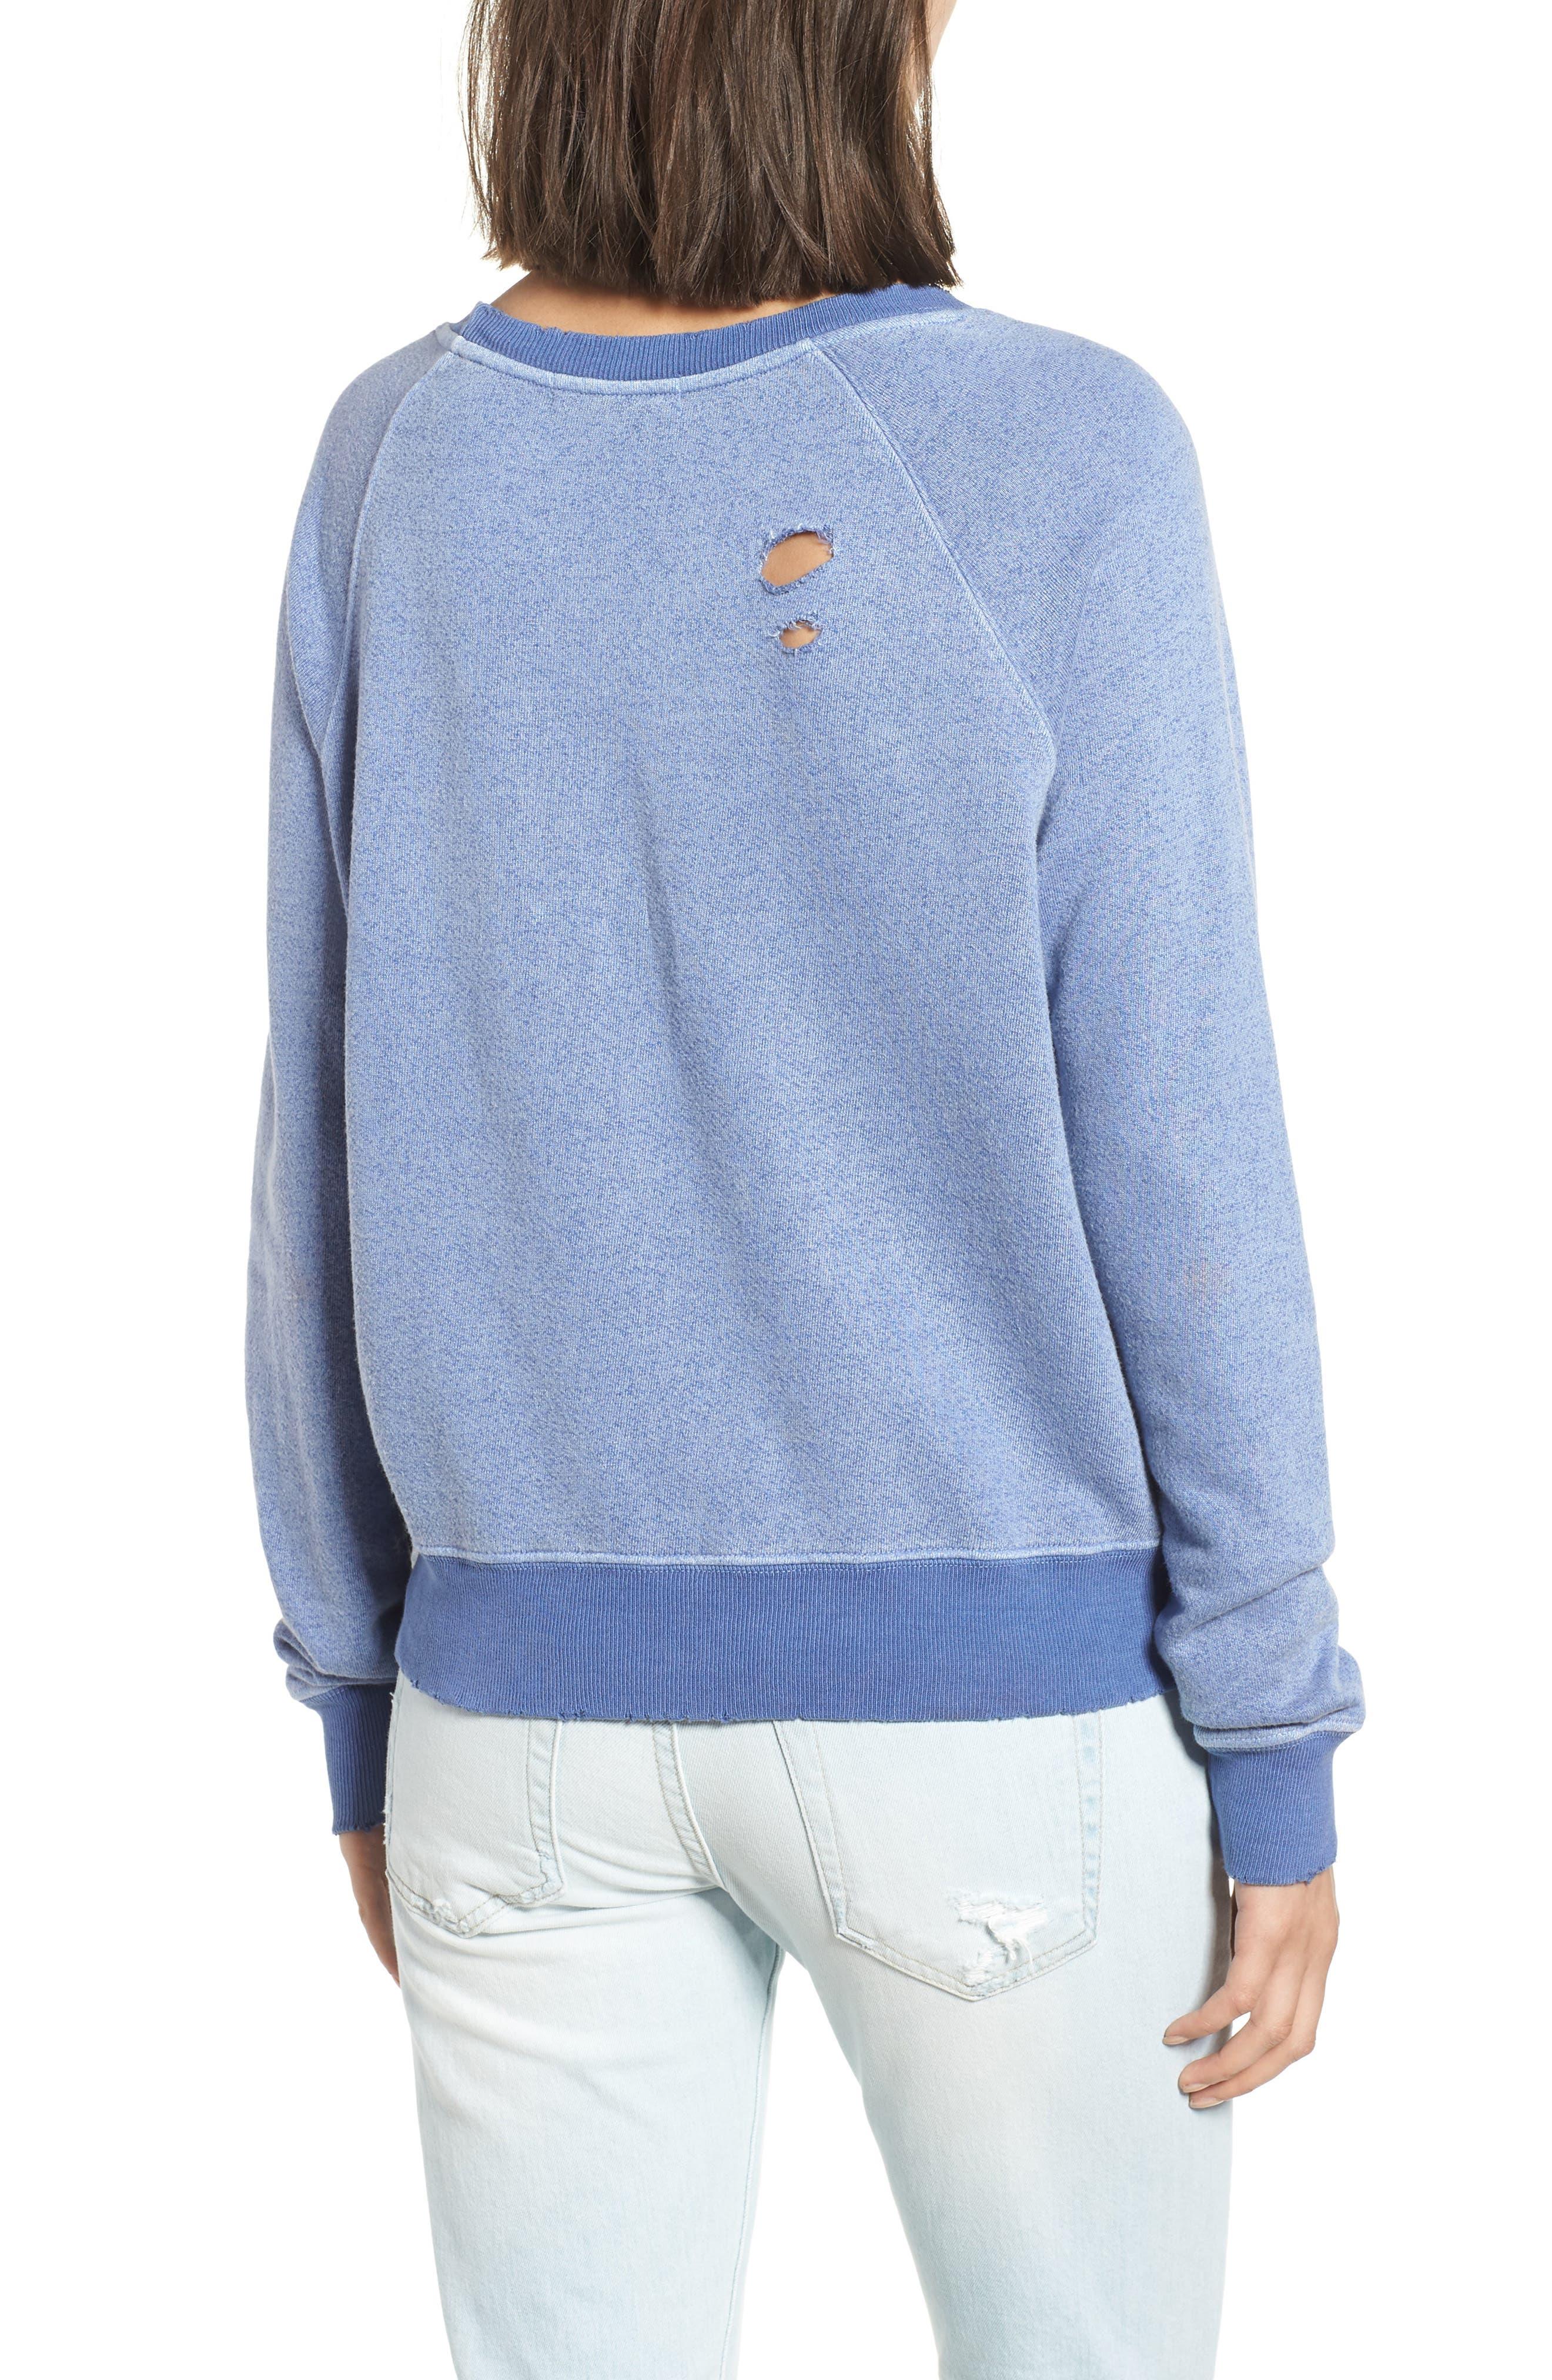 Belize Deconstructed Sweatshirt,                             Alternate thumbnail 2, color,                             COBALT